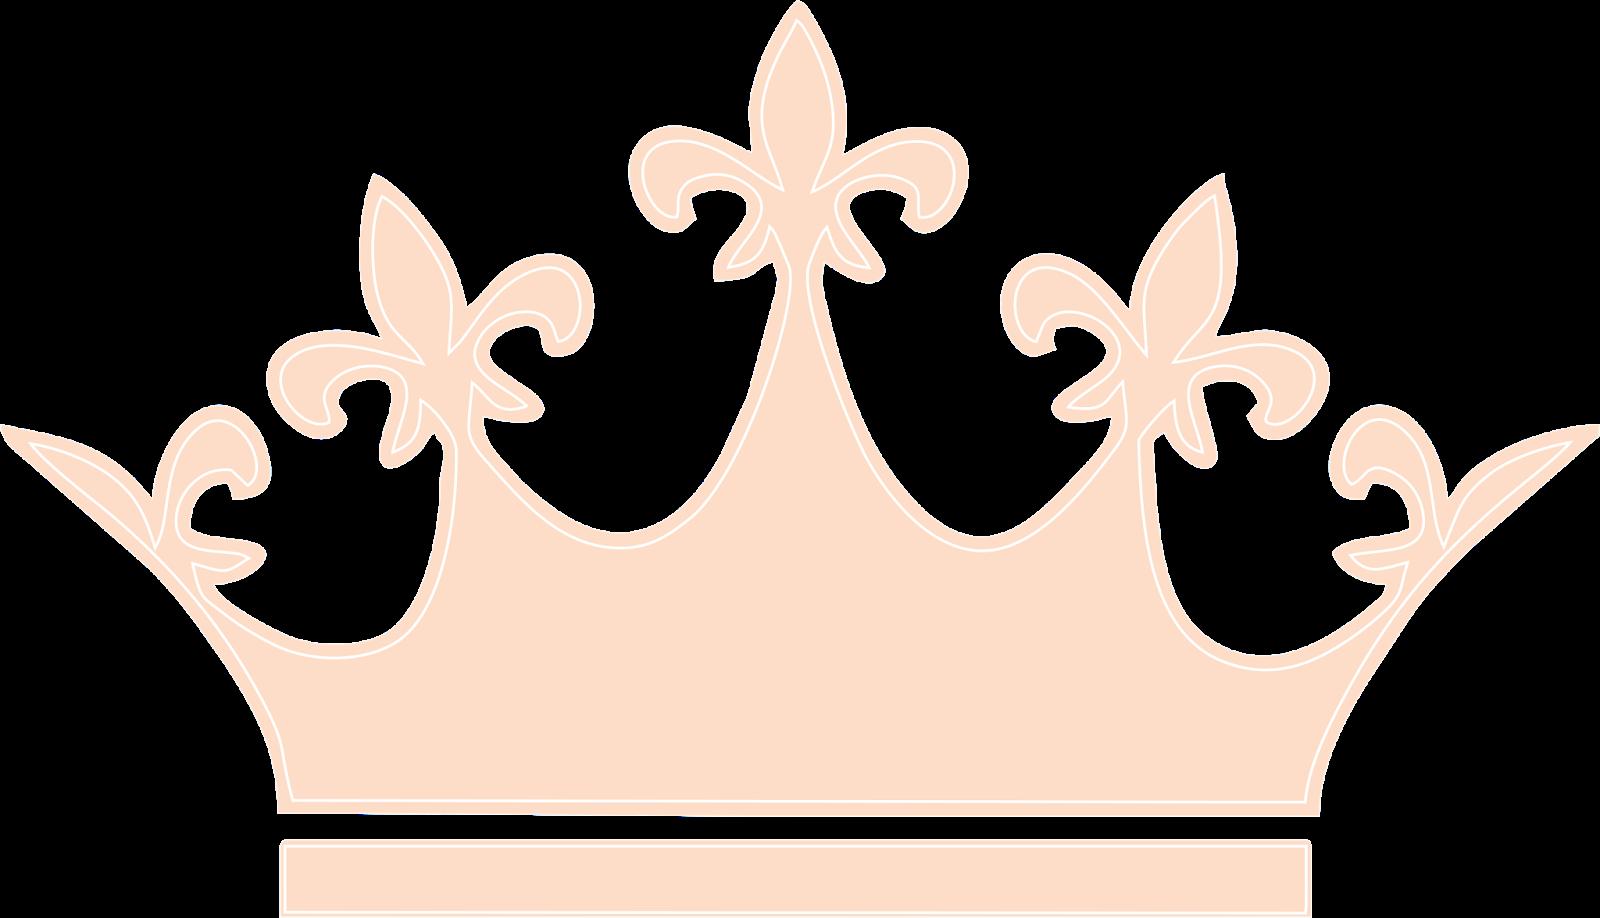 Rodeo queen crown clipart picture transparent library Coroa imagem para montagens digitais | Layouts and Template picture transparent library